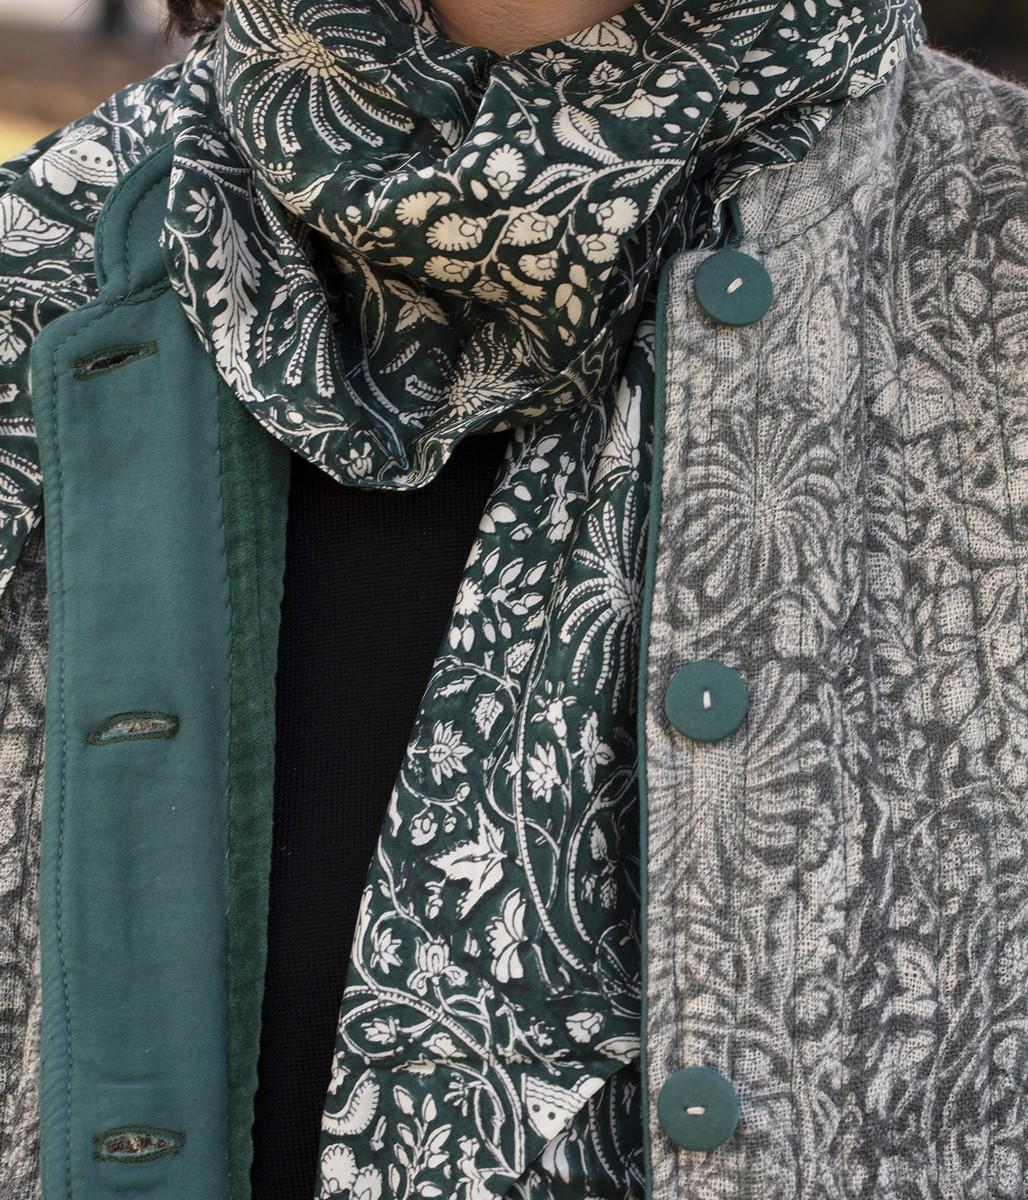 Giacca Guru in lana stampata a mano / Foulard triangolo in rayon stampato a mano